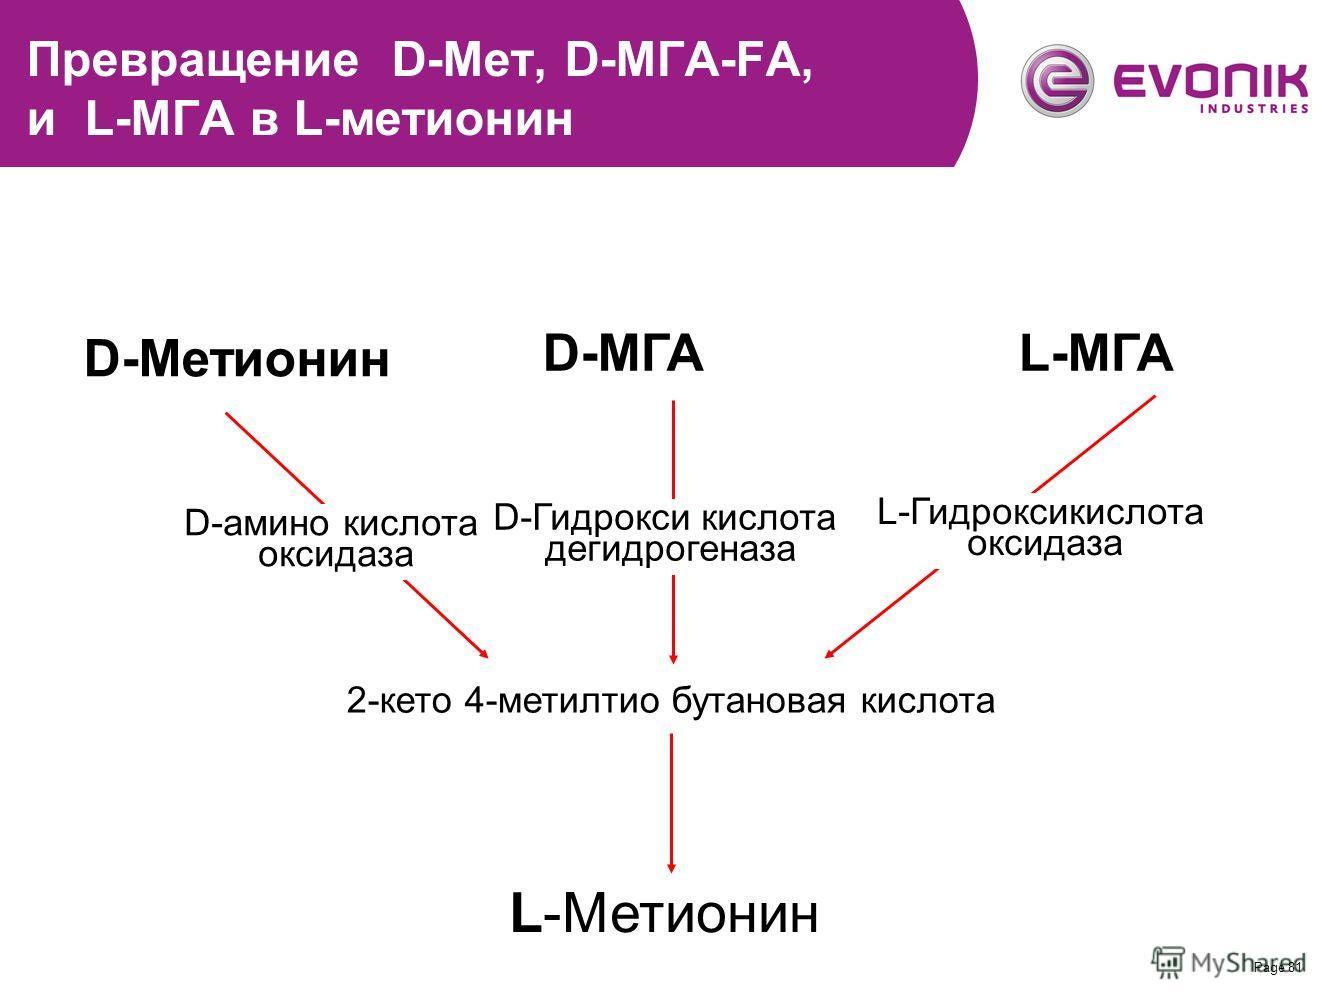 Page 81 Превращение D-Мет, D-МГА-FA, и L-МГА в L-метионин D-Метионин D-МГАL-МГА D-амино кислота оксидаза D-Гидрокси кислота дегидрогеназа L-Гидроксикислота оксидаза L-Метионин 2-кето 4-метилтио бутановая кислота